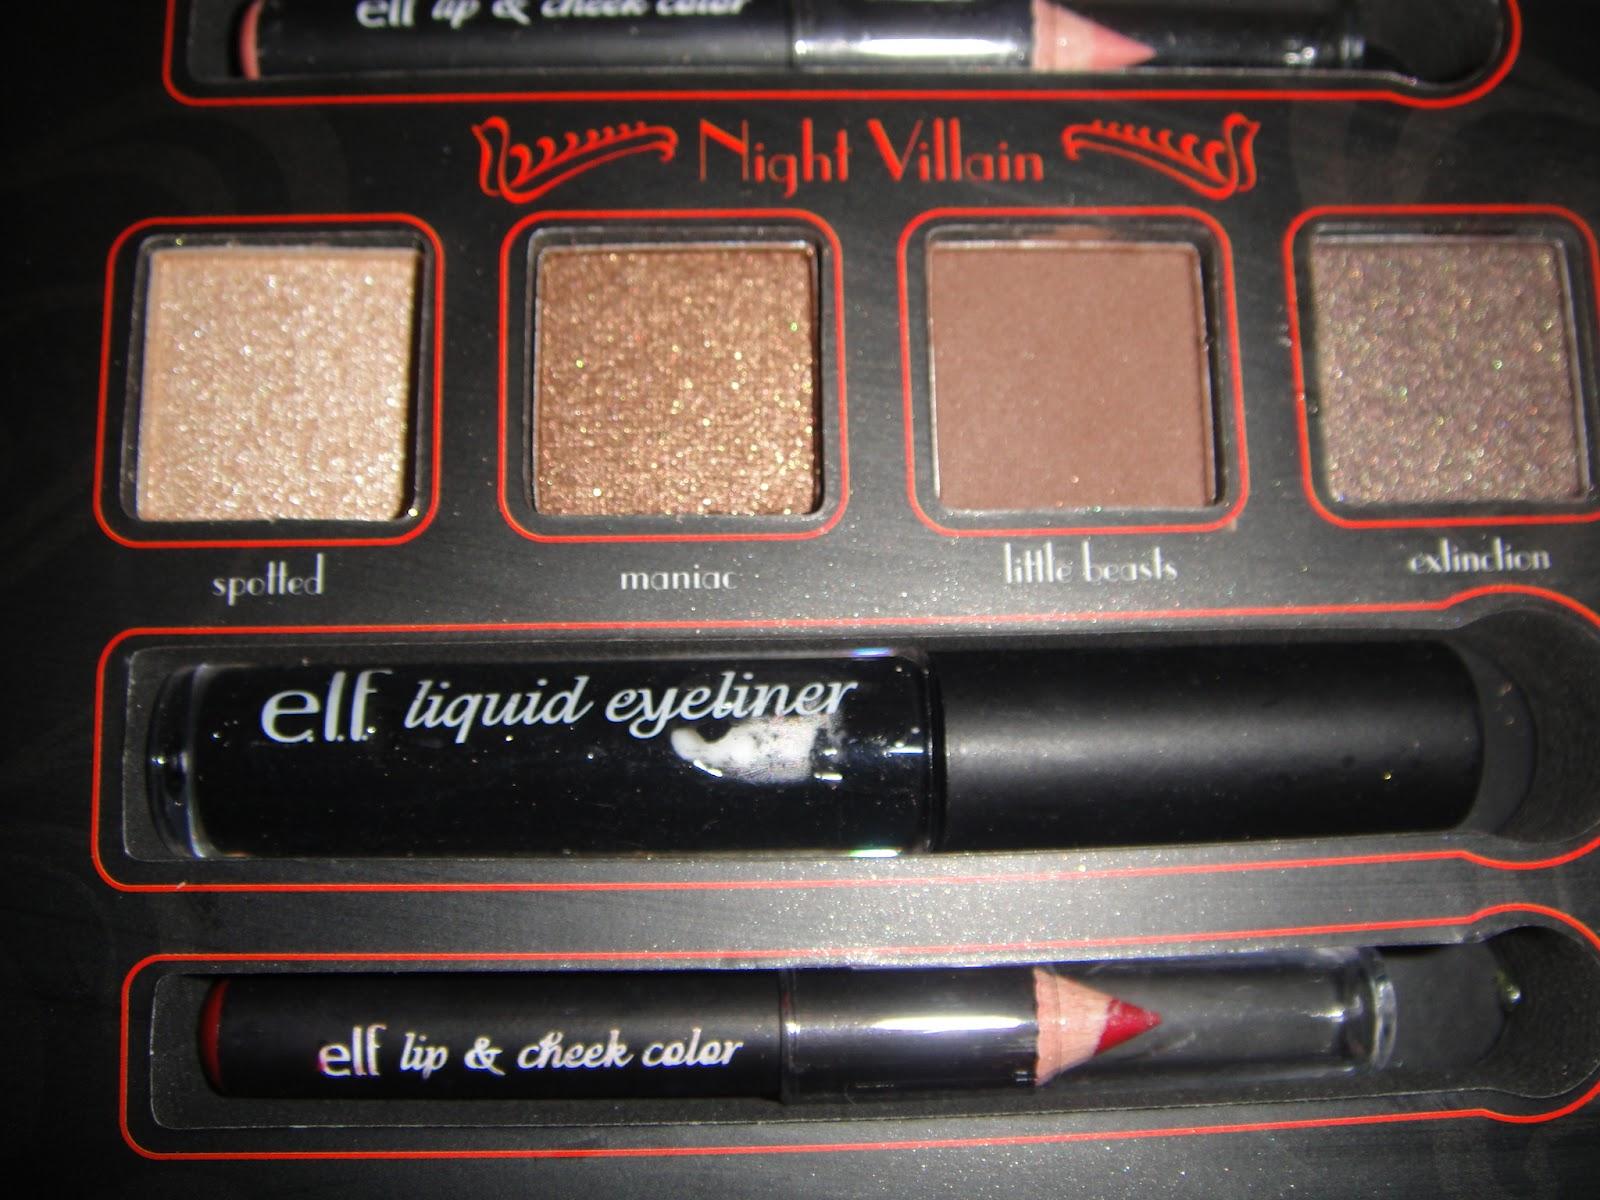 e.l.f.'s Villainous Villain: Cruella, halloween makeup, disney, villanious villains, elf, cruella, makeup kit, swatches, test